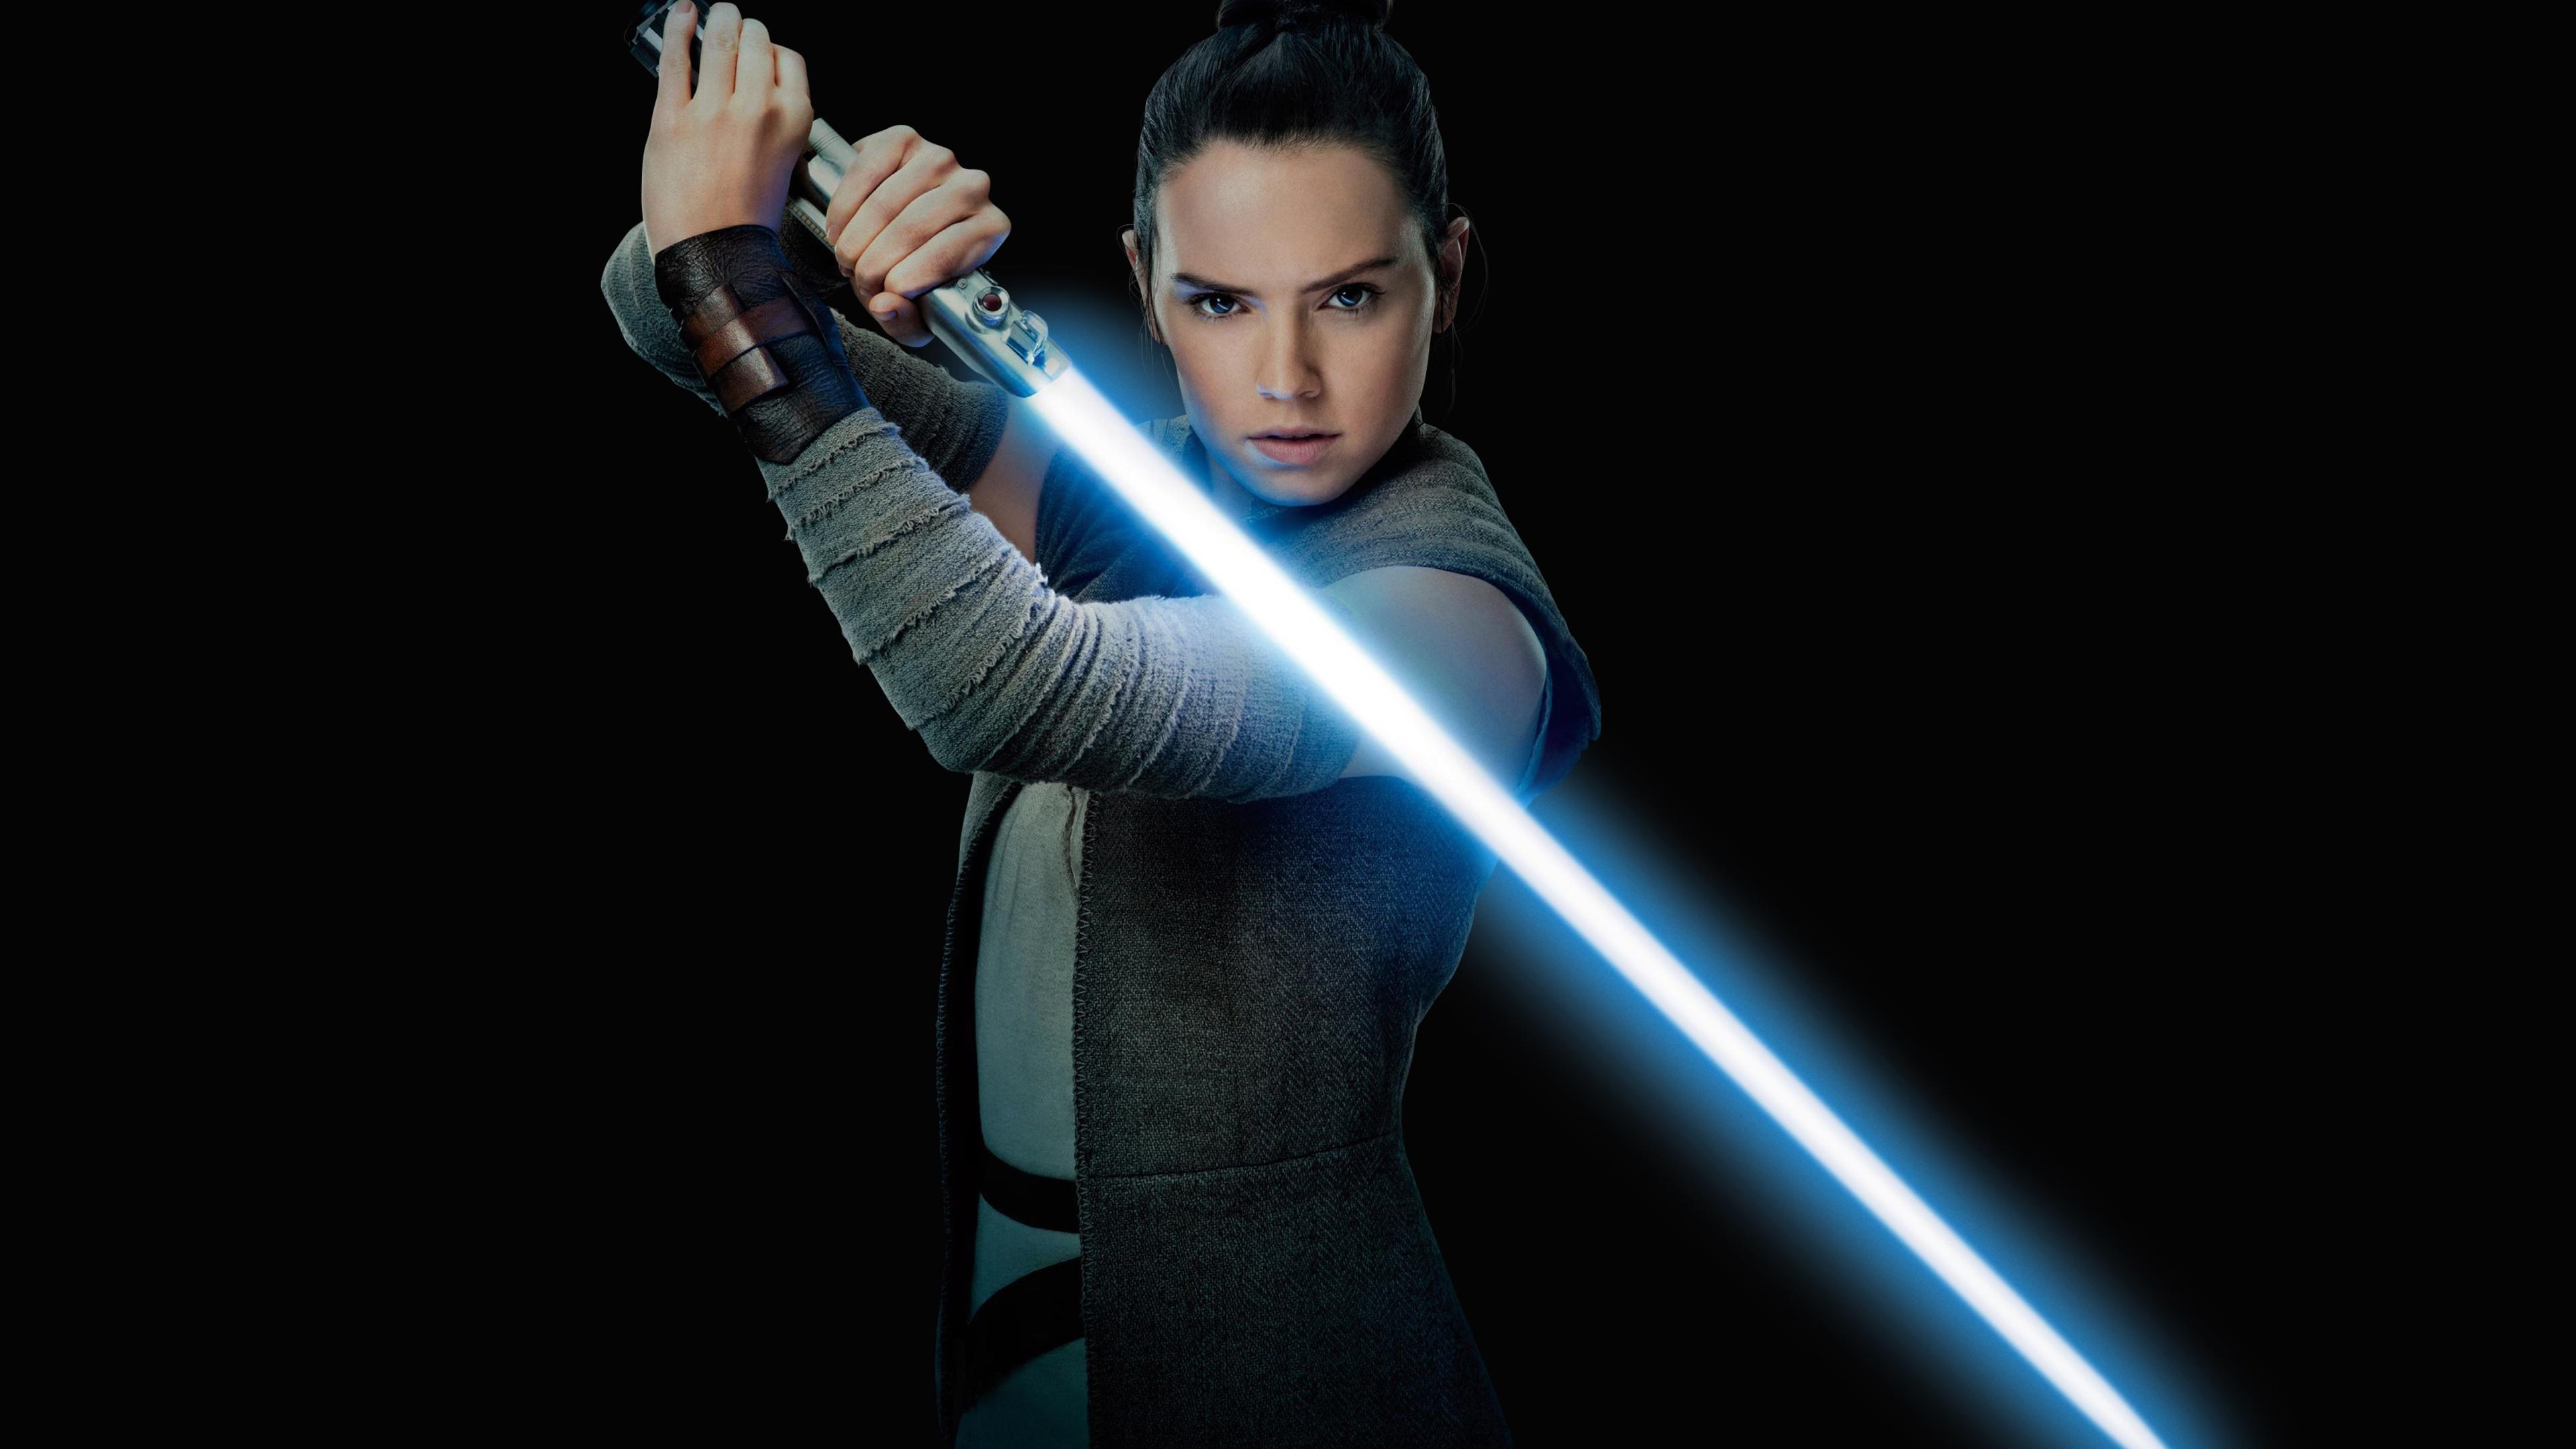 3840x2160 Daisy Ridley As Rey Star Wars In The Last Jedi